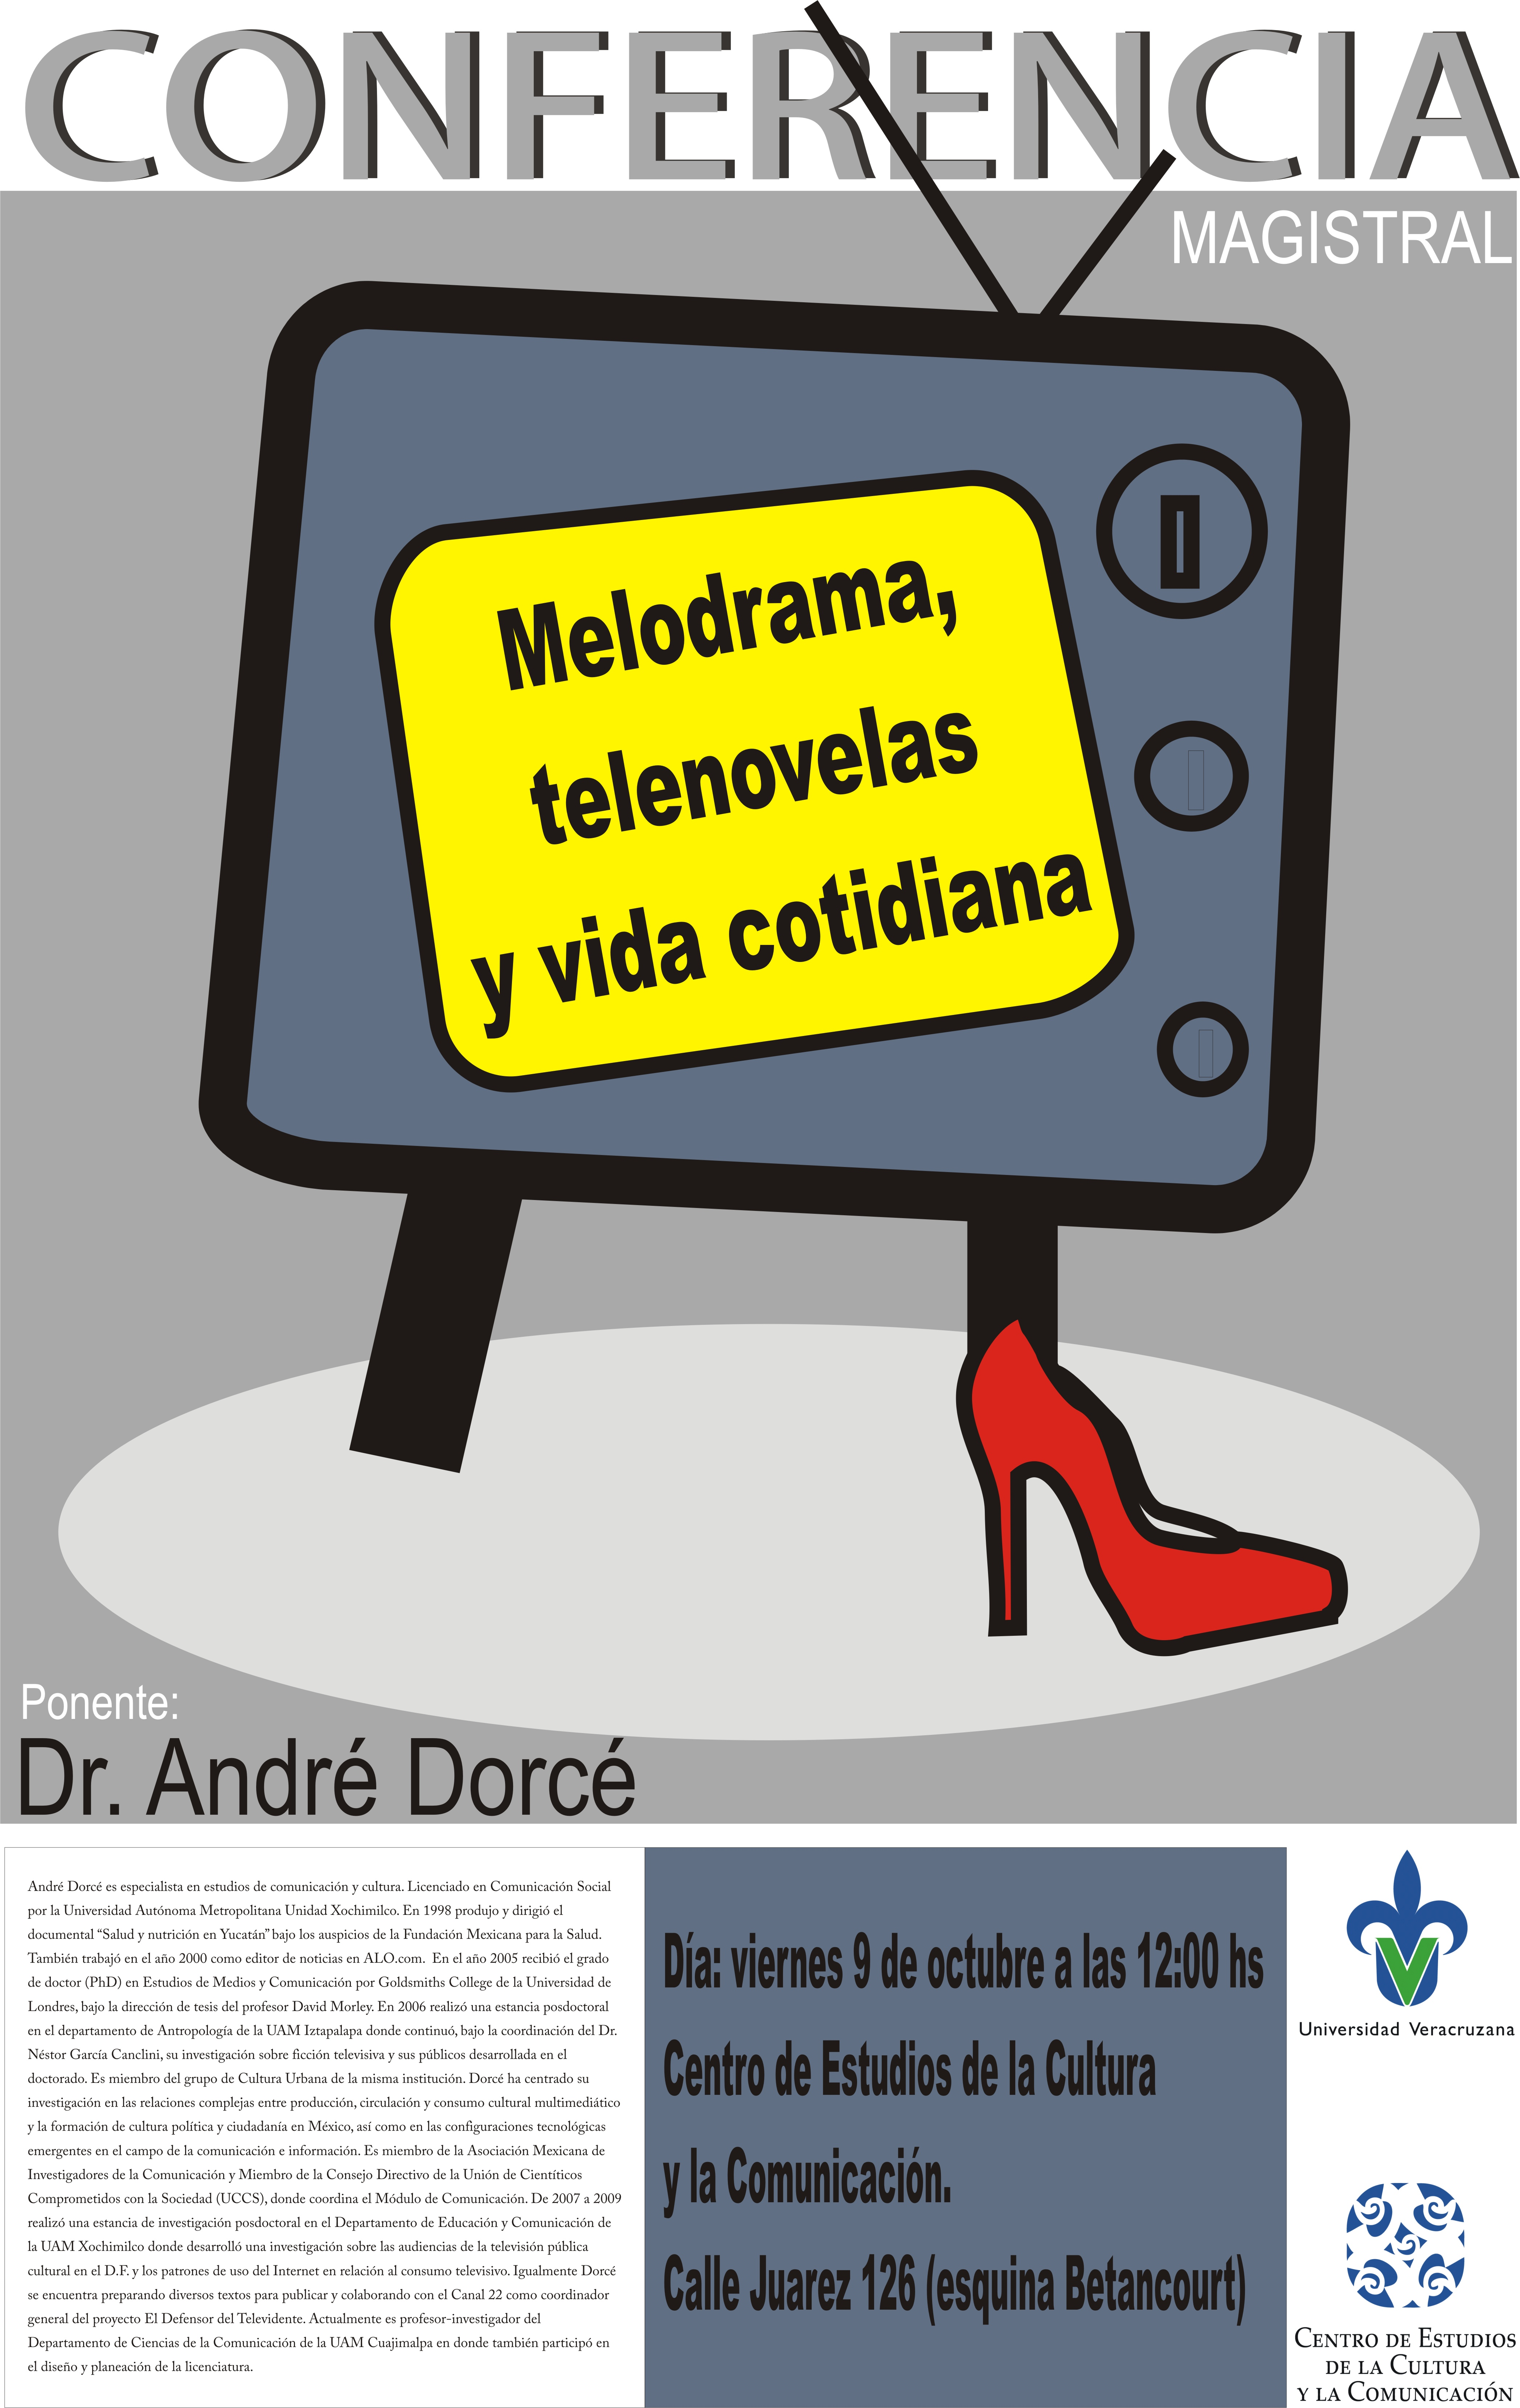 Melodramas, telenovelas y vida cotidiana